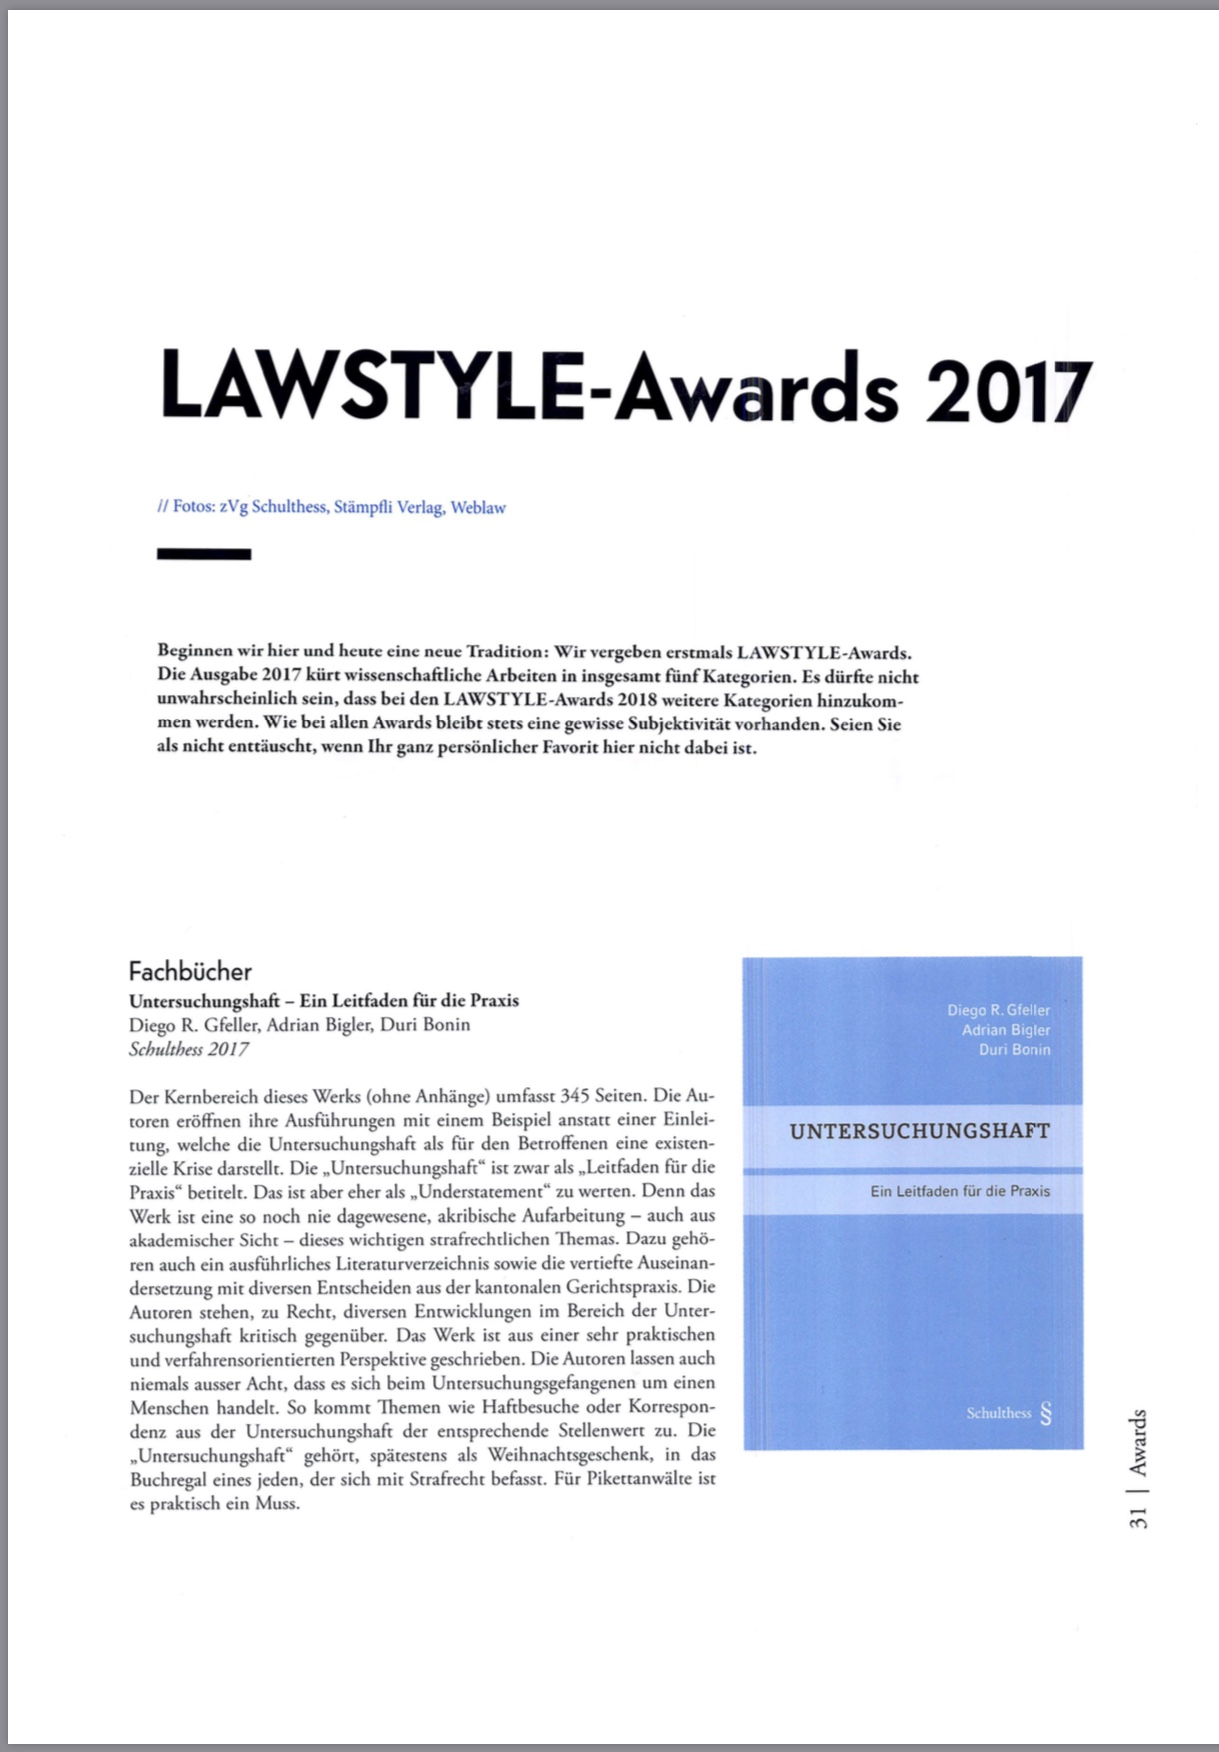 Lawstyle Award: Fachbuch des Jahres 2017